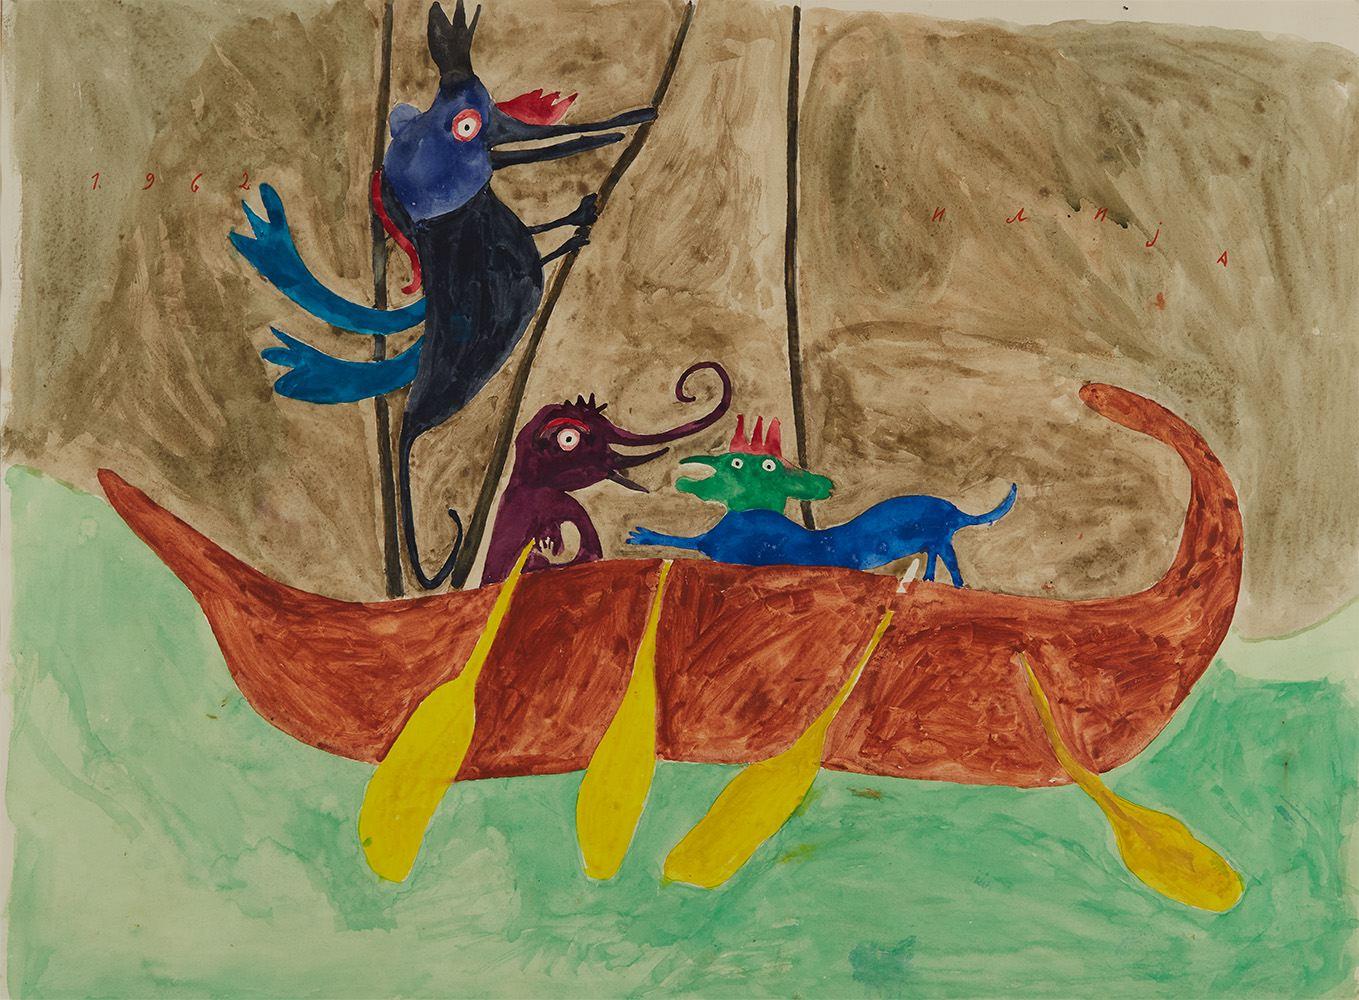 Ilija Bosilj Bašičević    The Apocalypse: The Argonauts  , 1962 Watercolor on paper 21 x 29 inches 53.3 x 73.7 cm IBo 9